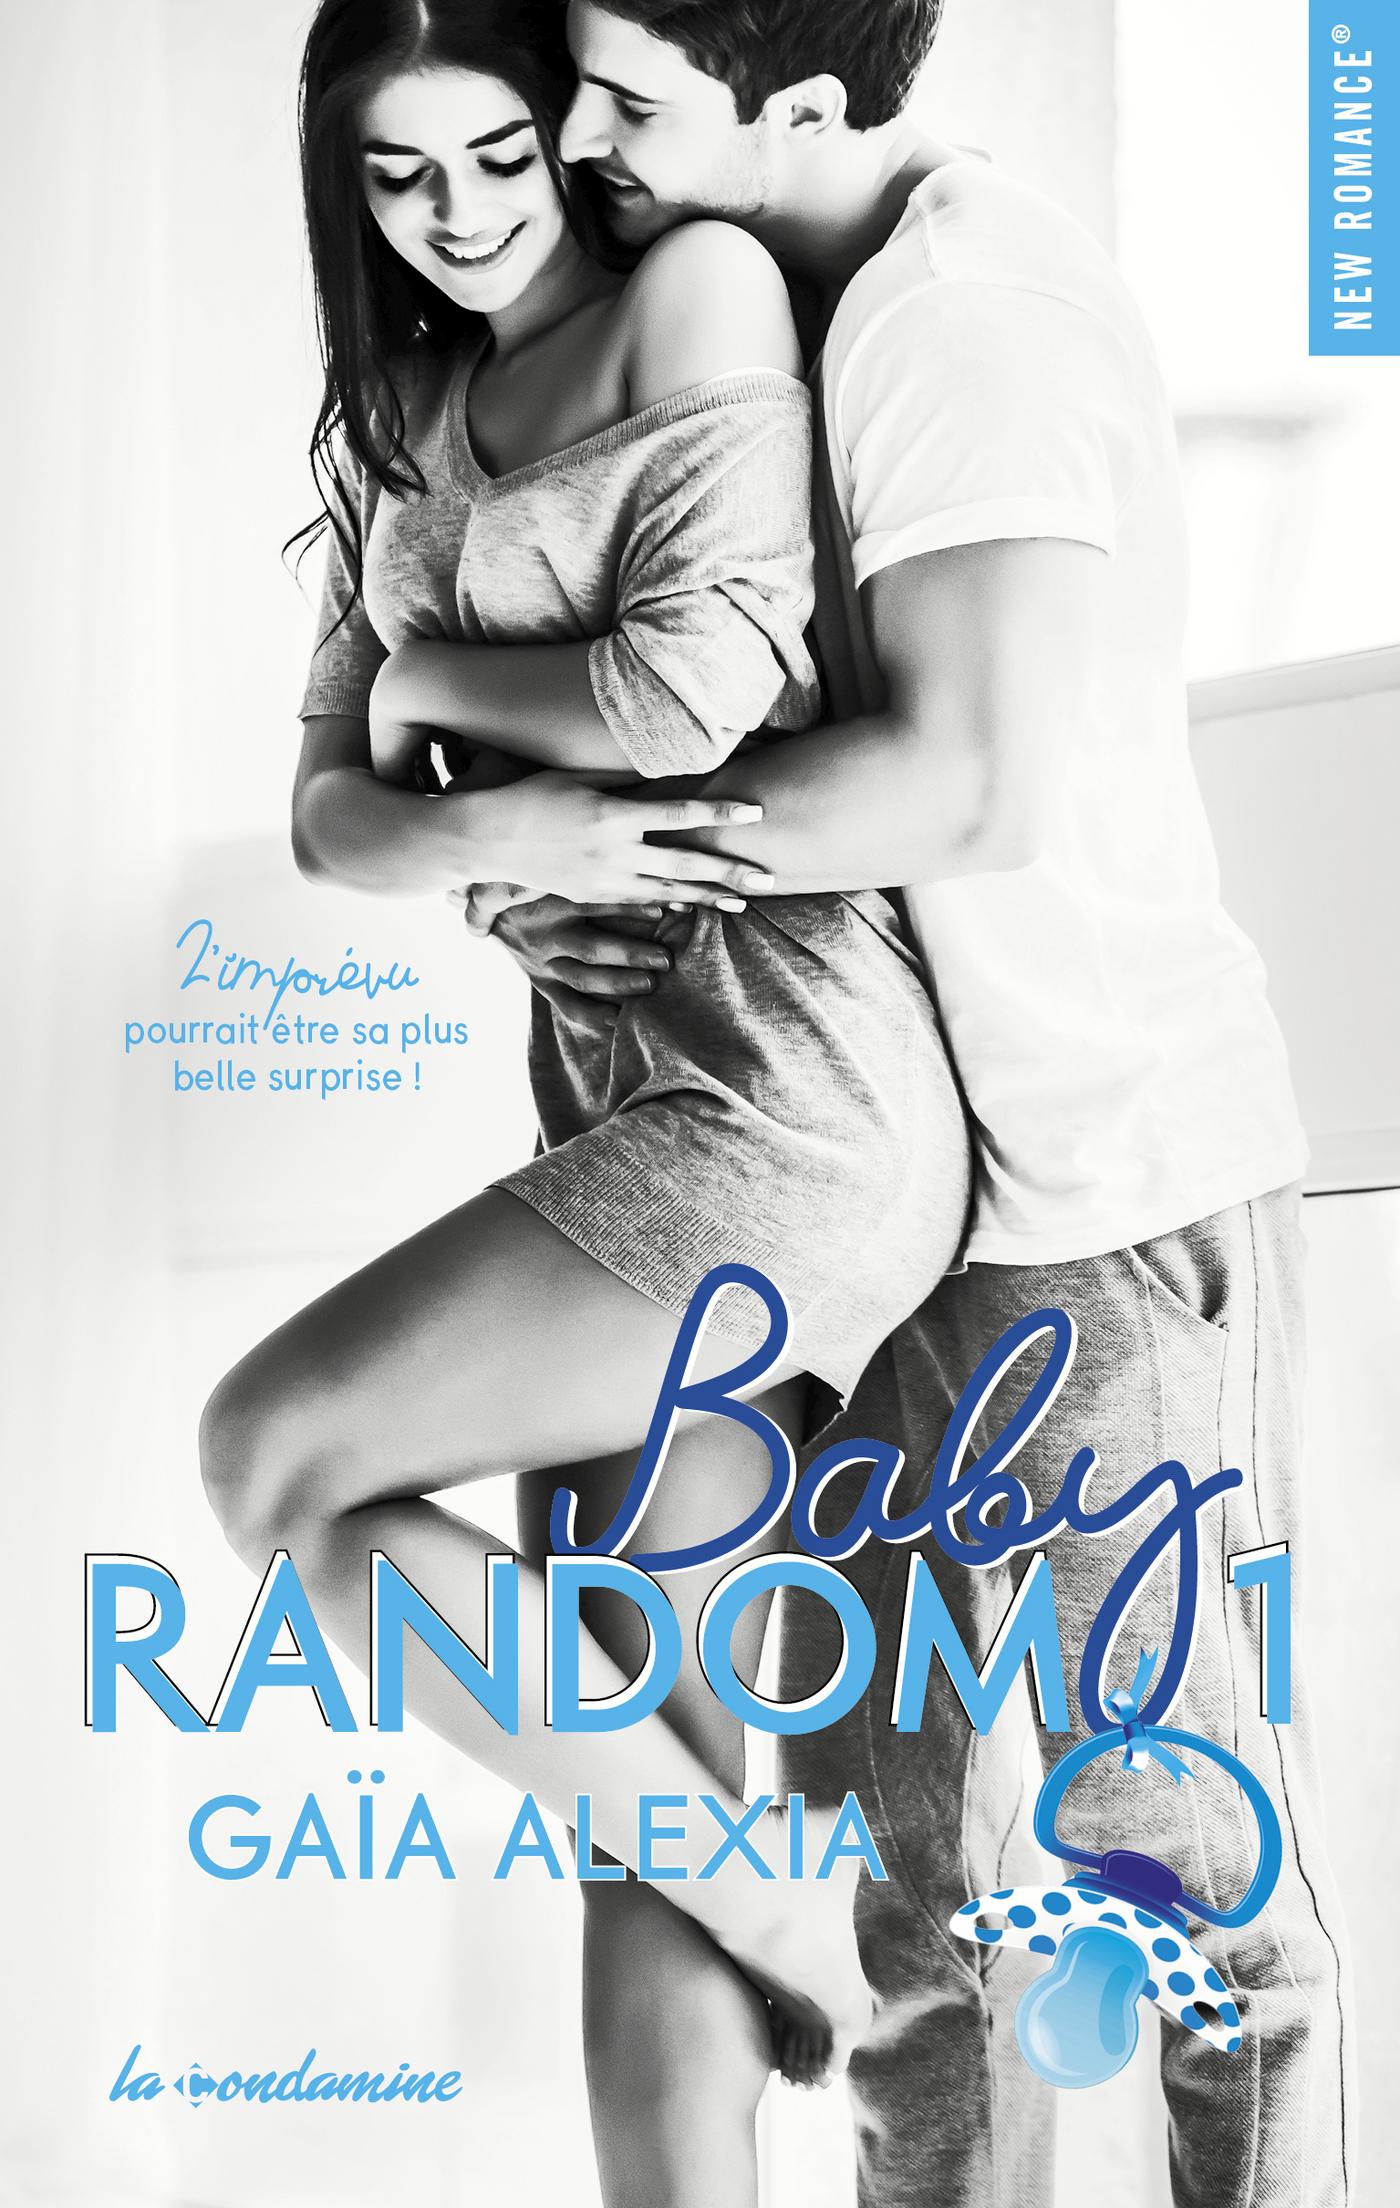 Baby random - tome 1